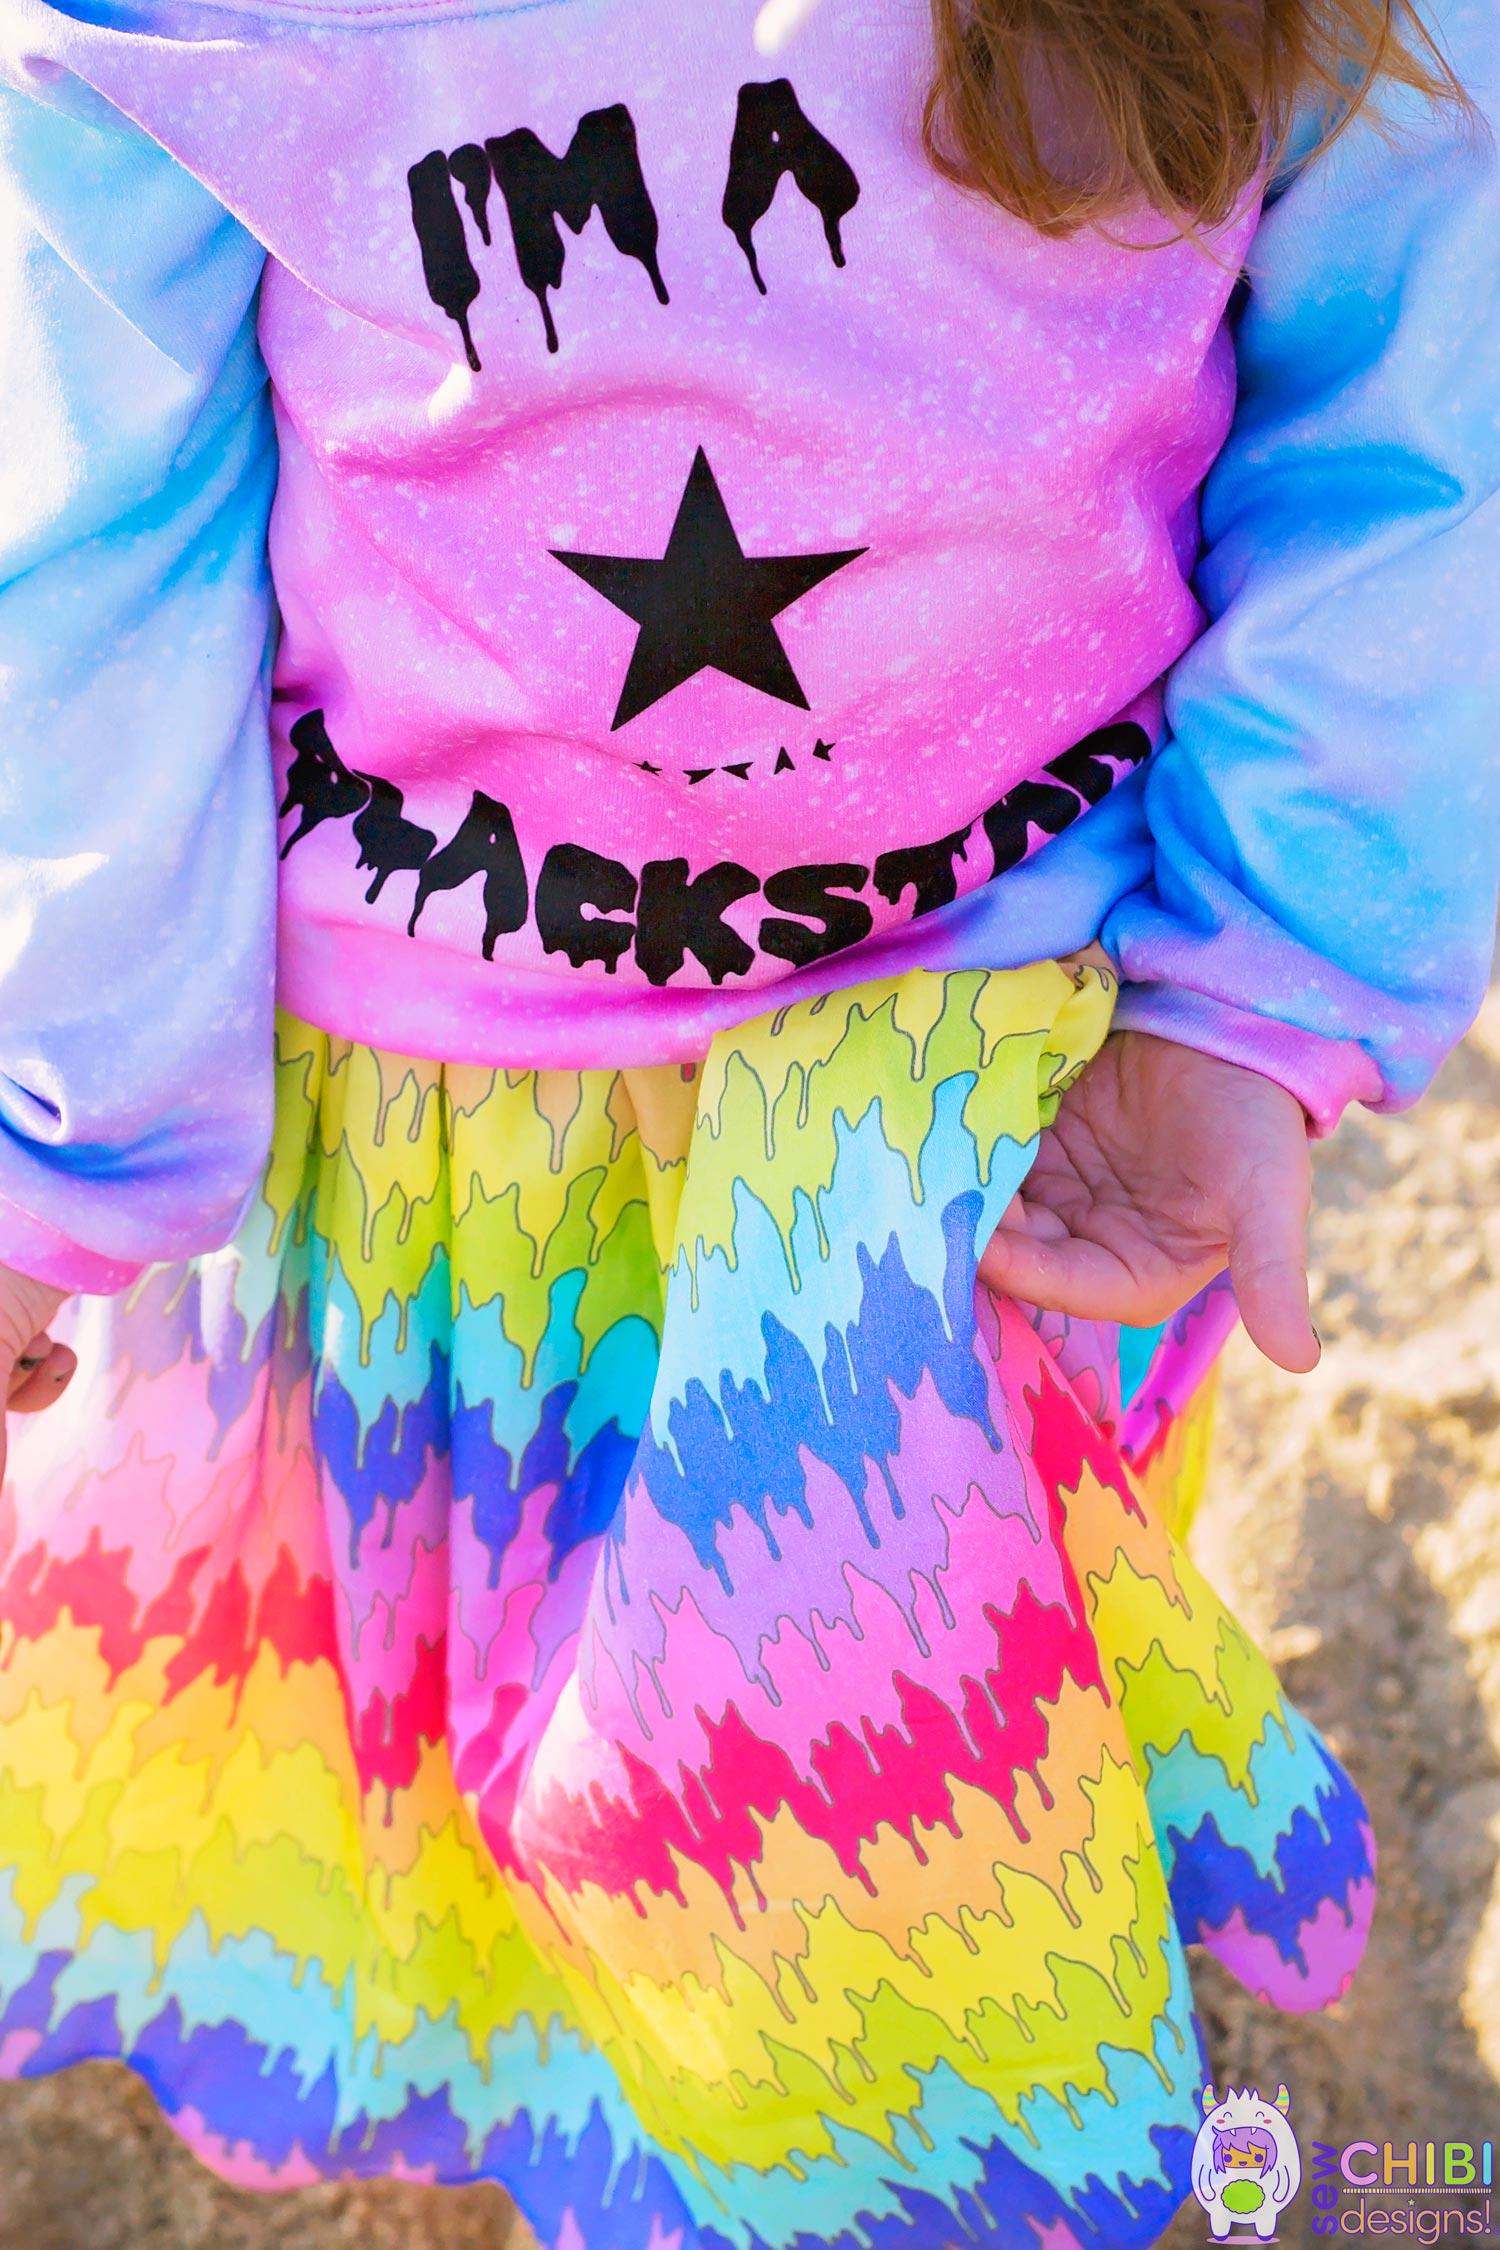 sephira-birthday-pastel-goth-and-bowie-17.jpg